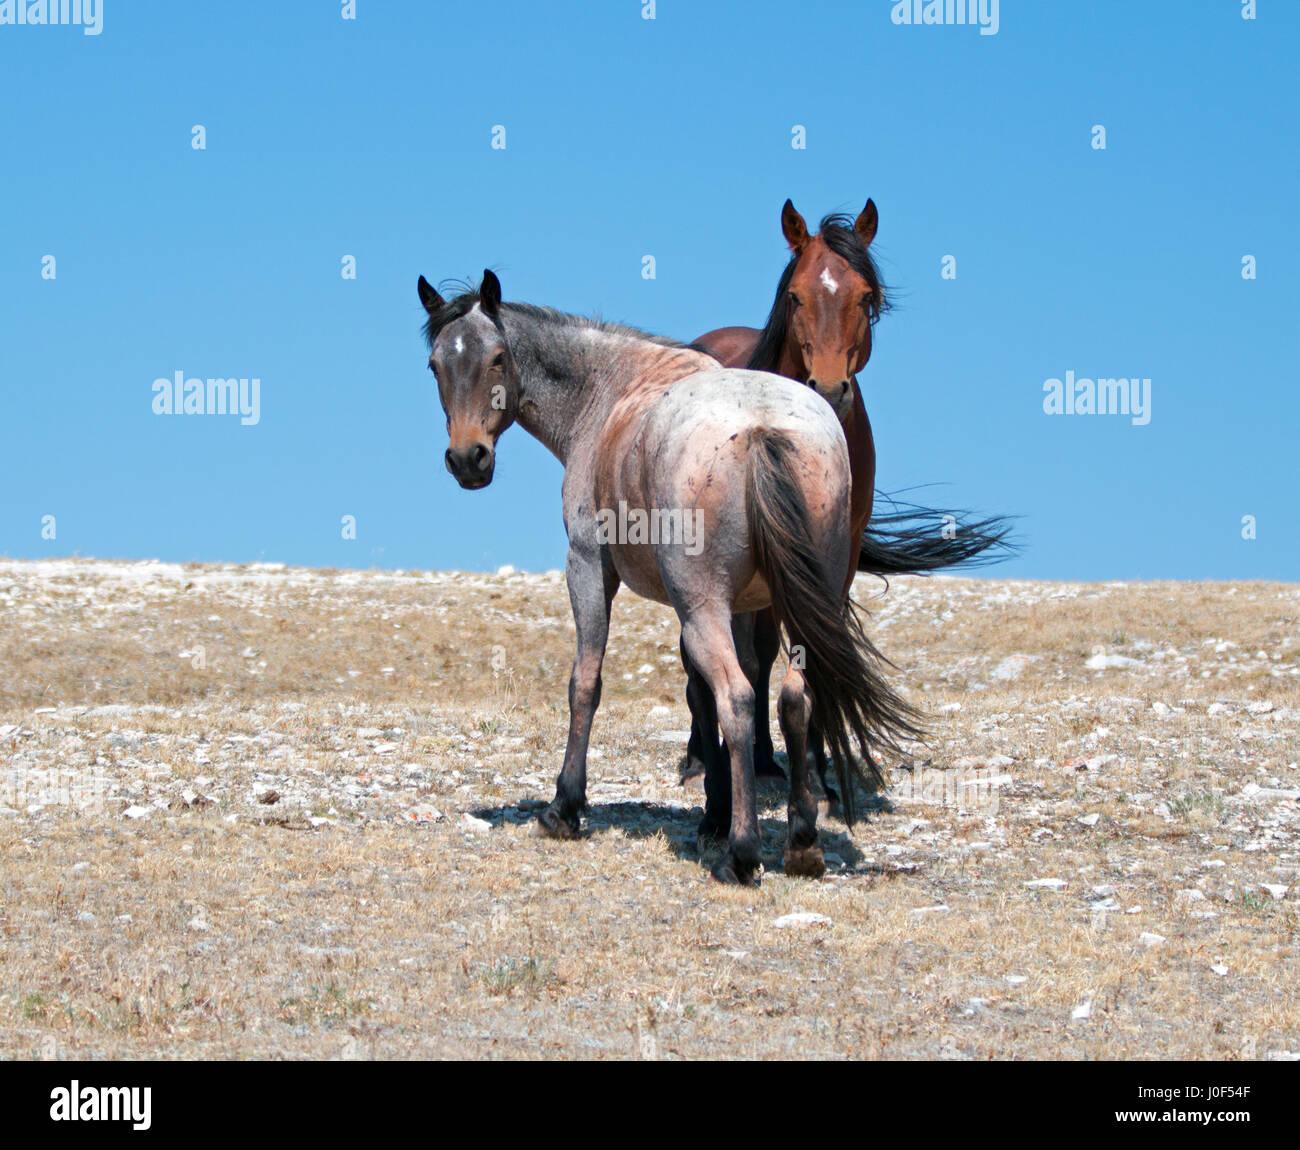 Strawberry Roan Horse Stock Photos & Strawberry Roan Horse ... - photo#18